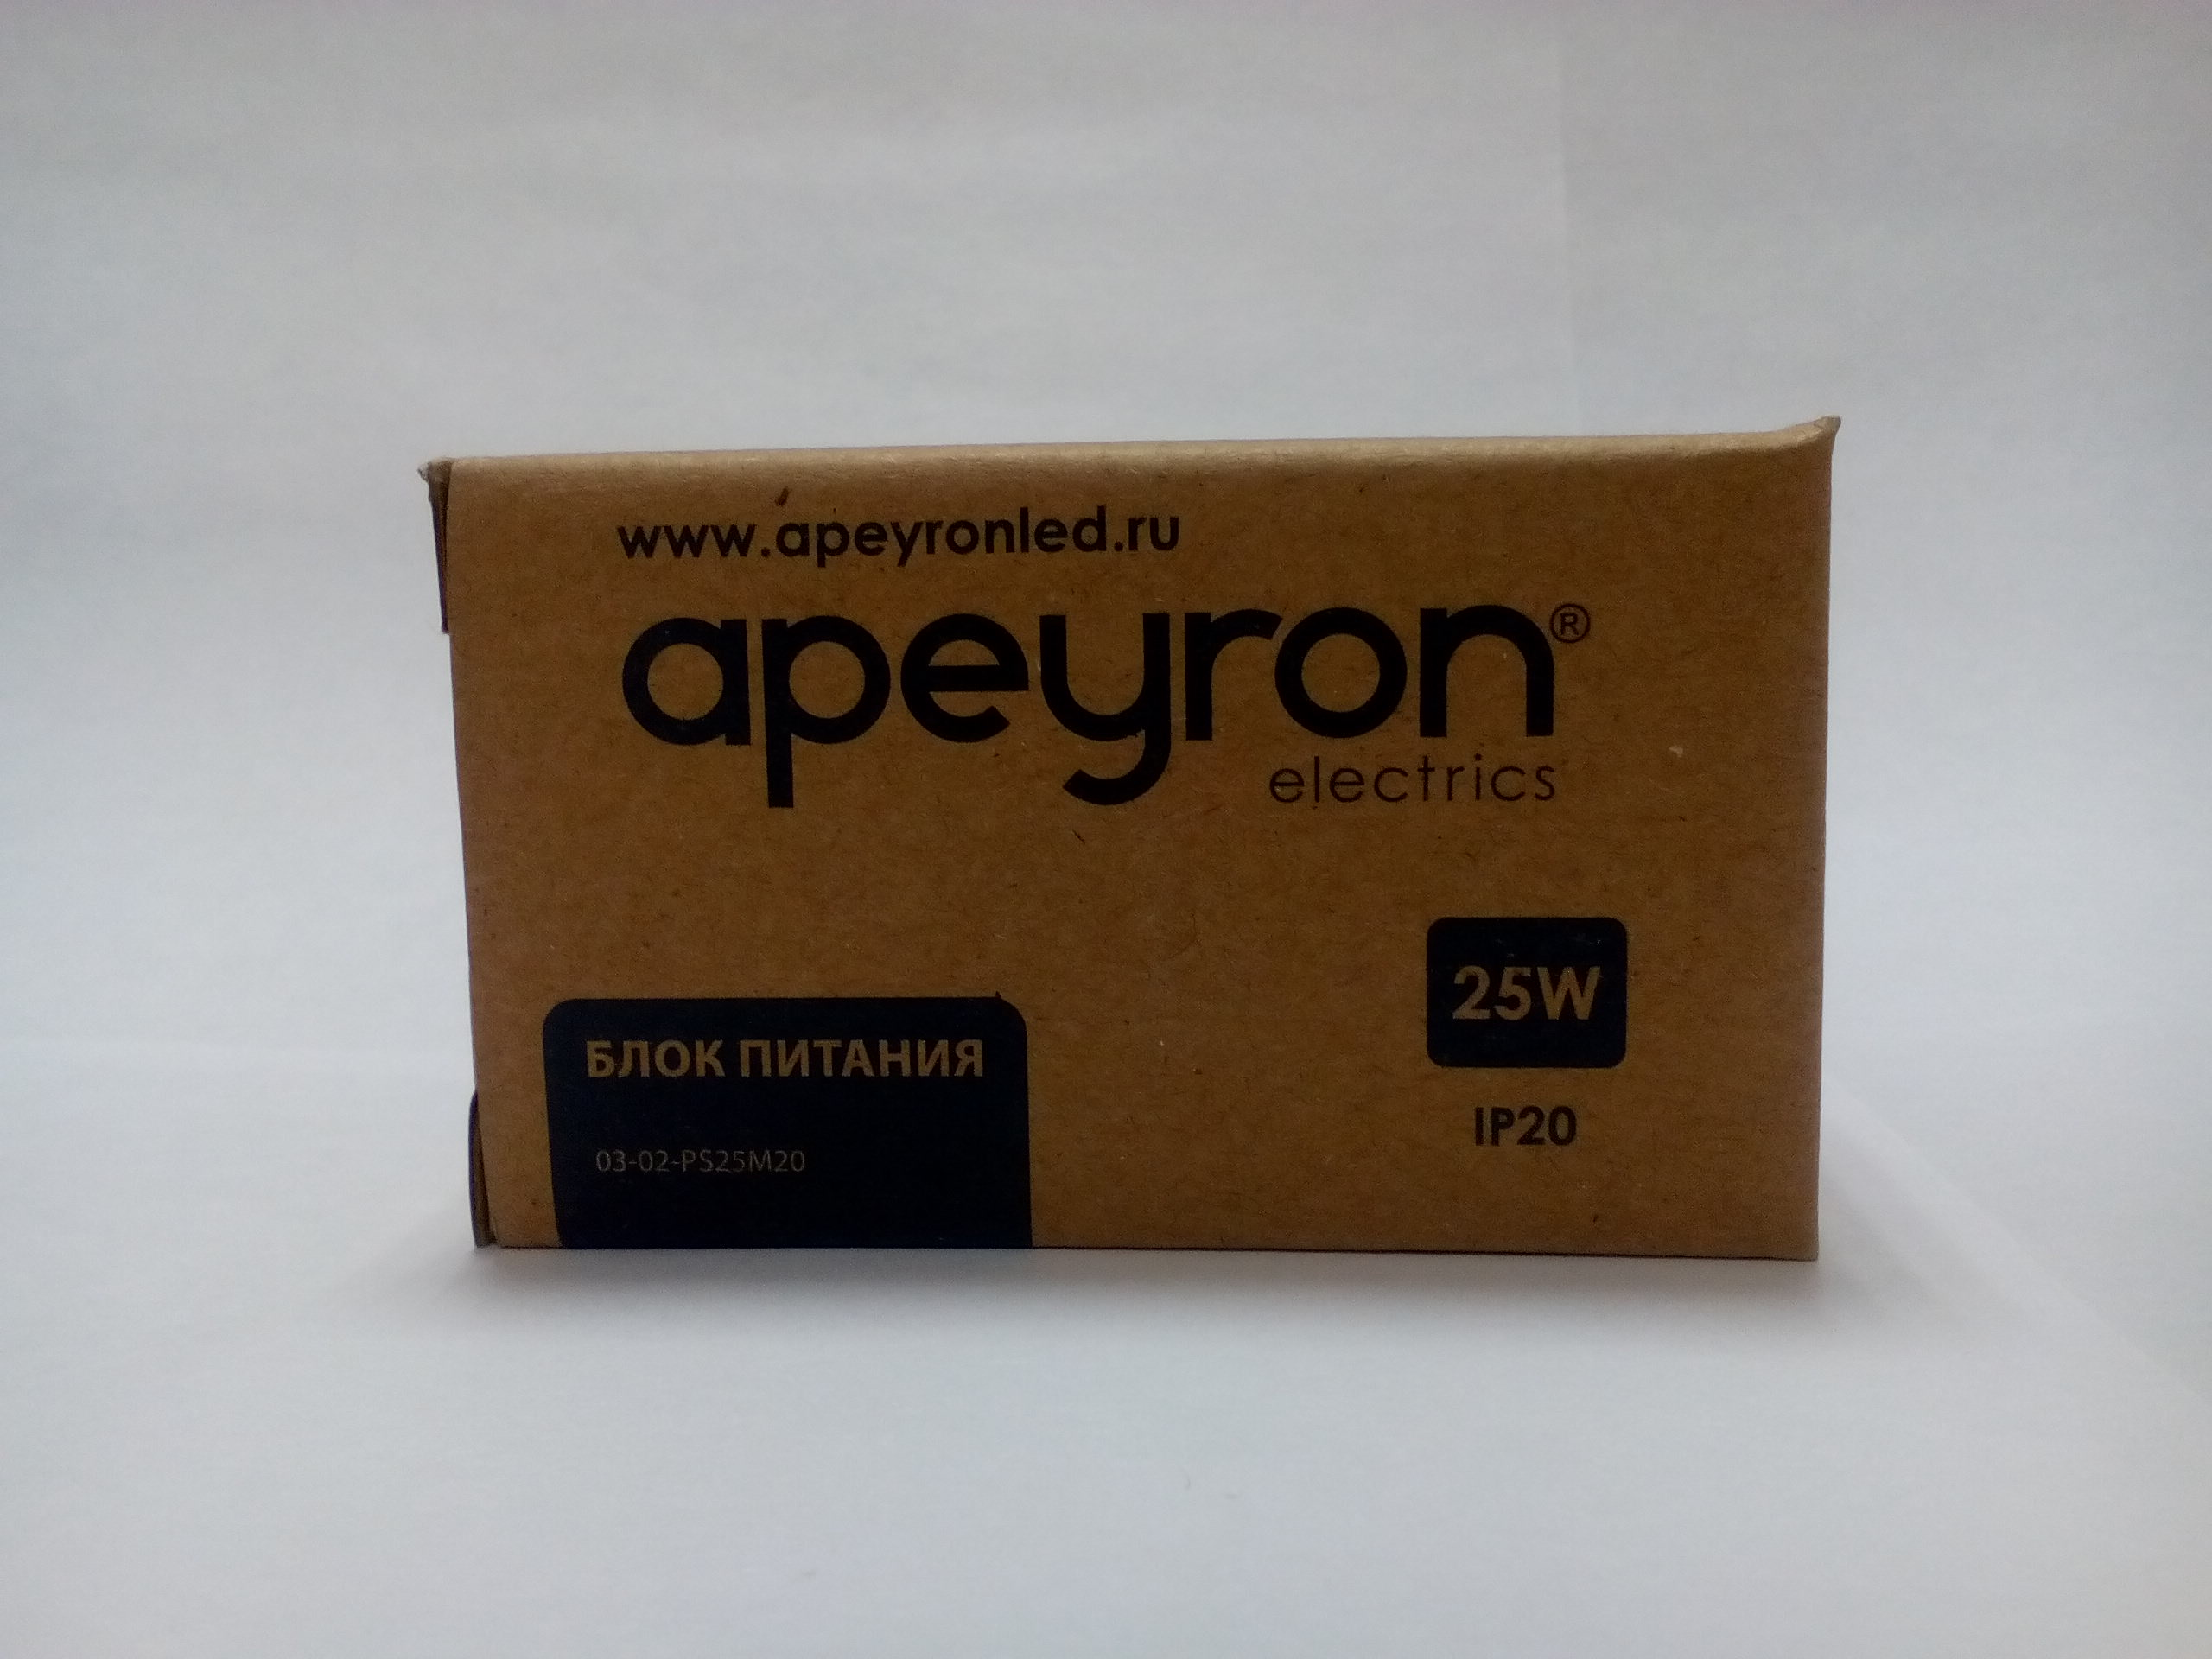 все цены на Блок питания Apeyron 02isp000050 онлайн